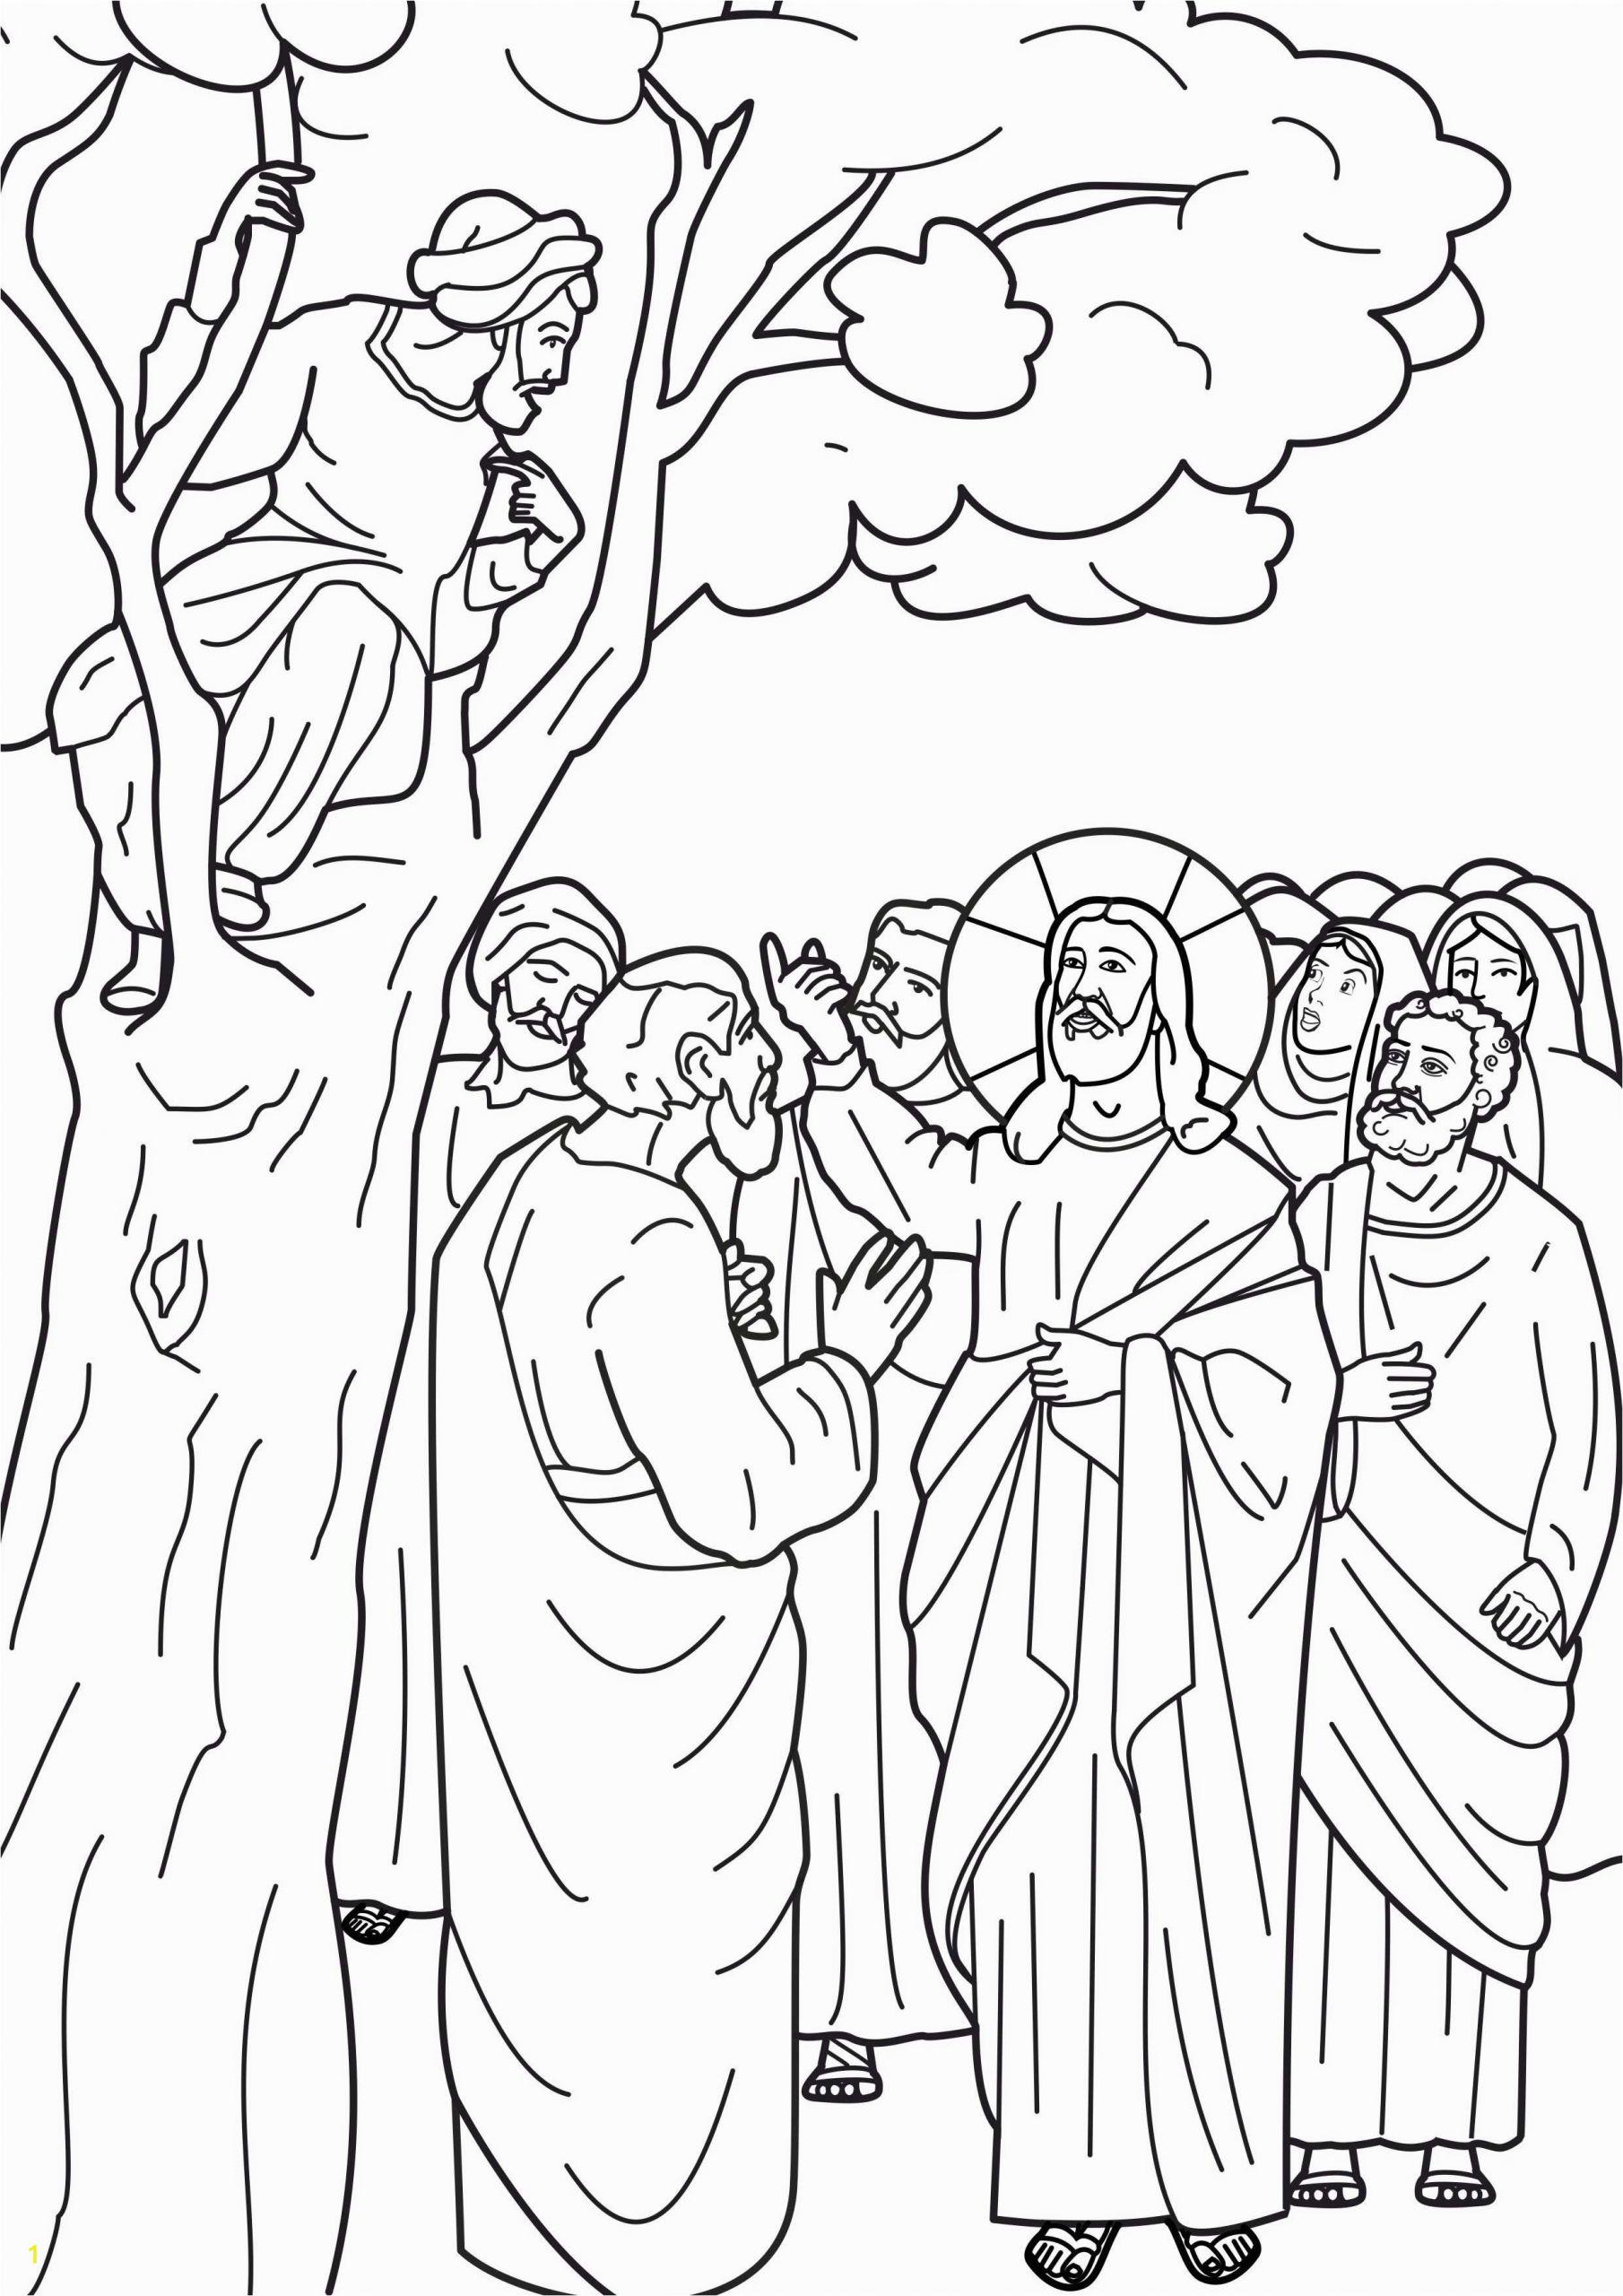 zacchaeus coloring page printable